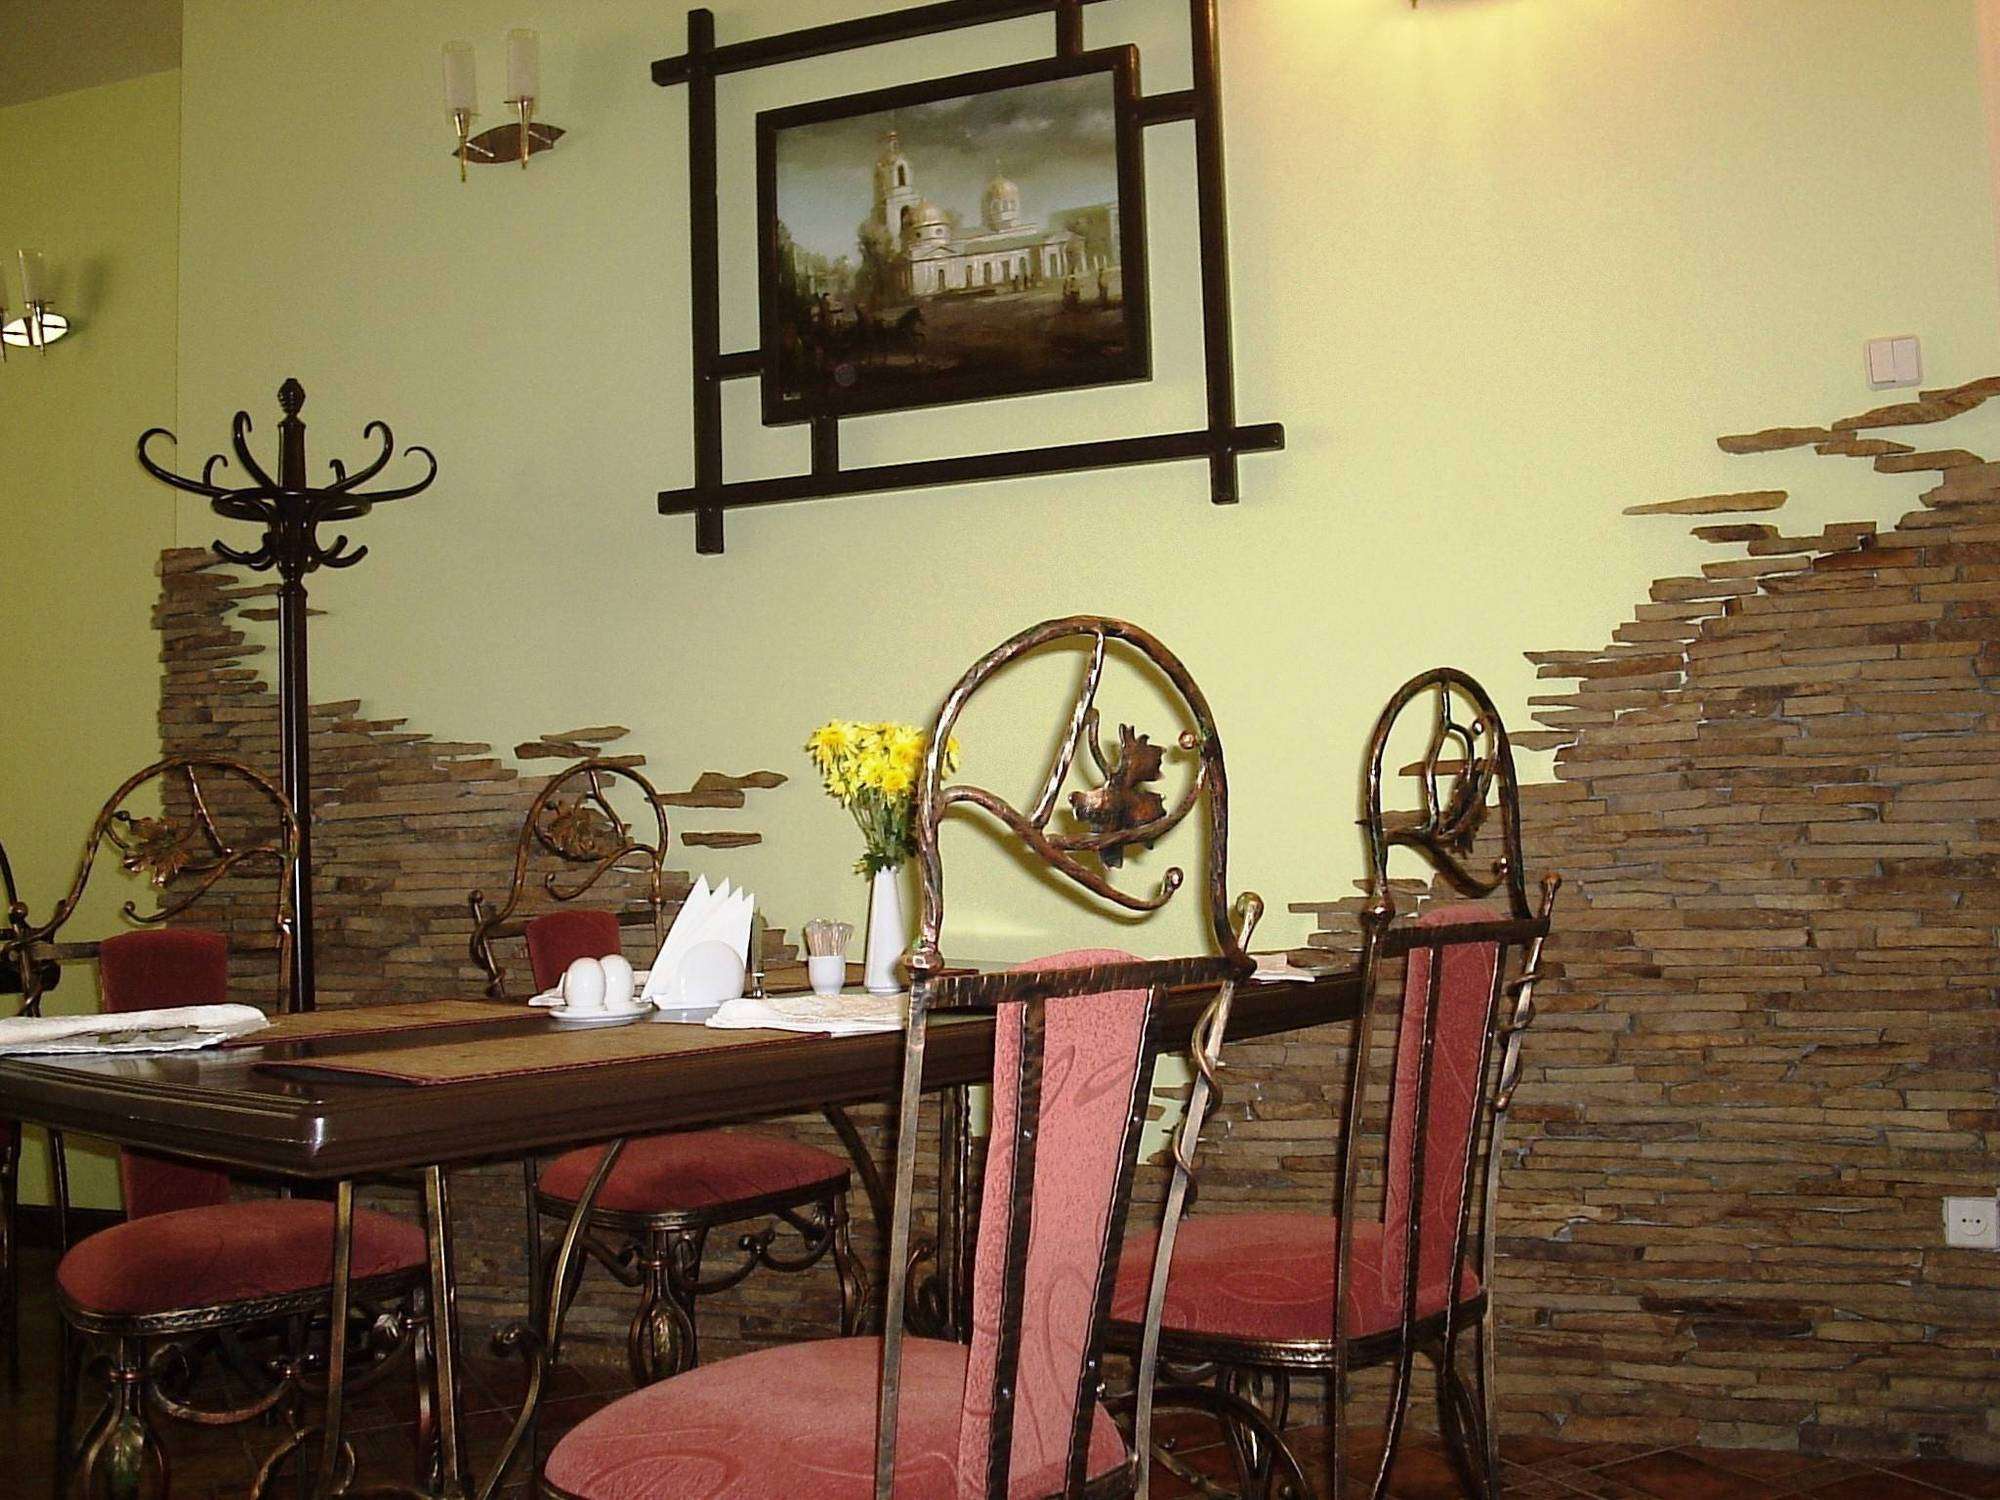 Дизайн кухни с искусственным камнем на стене фото